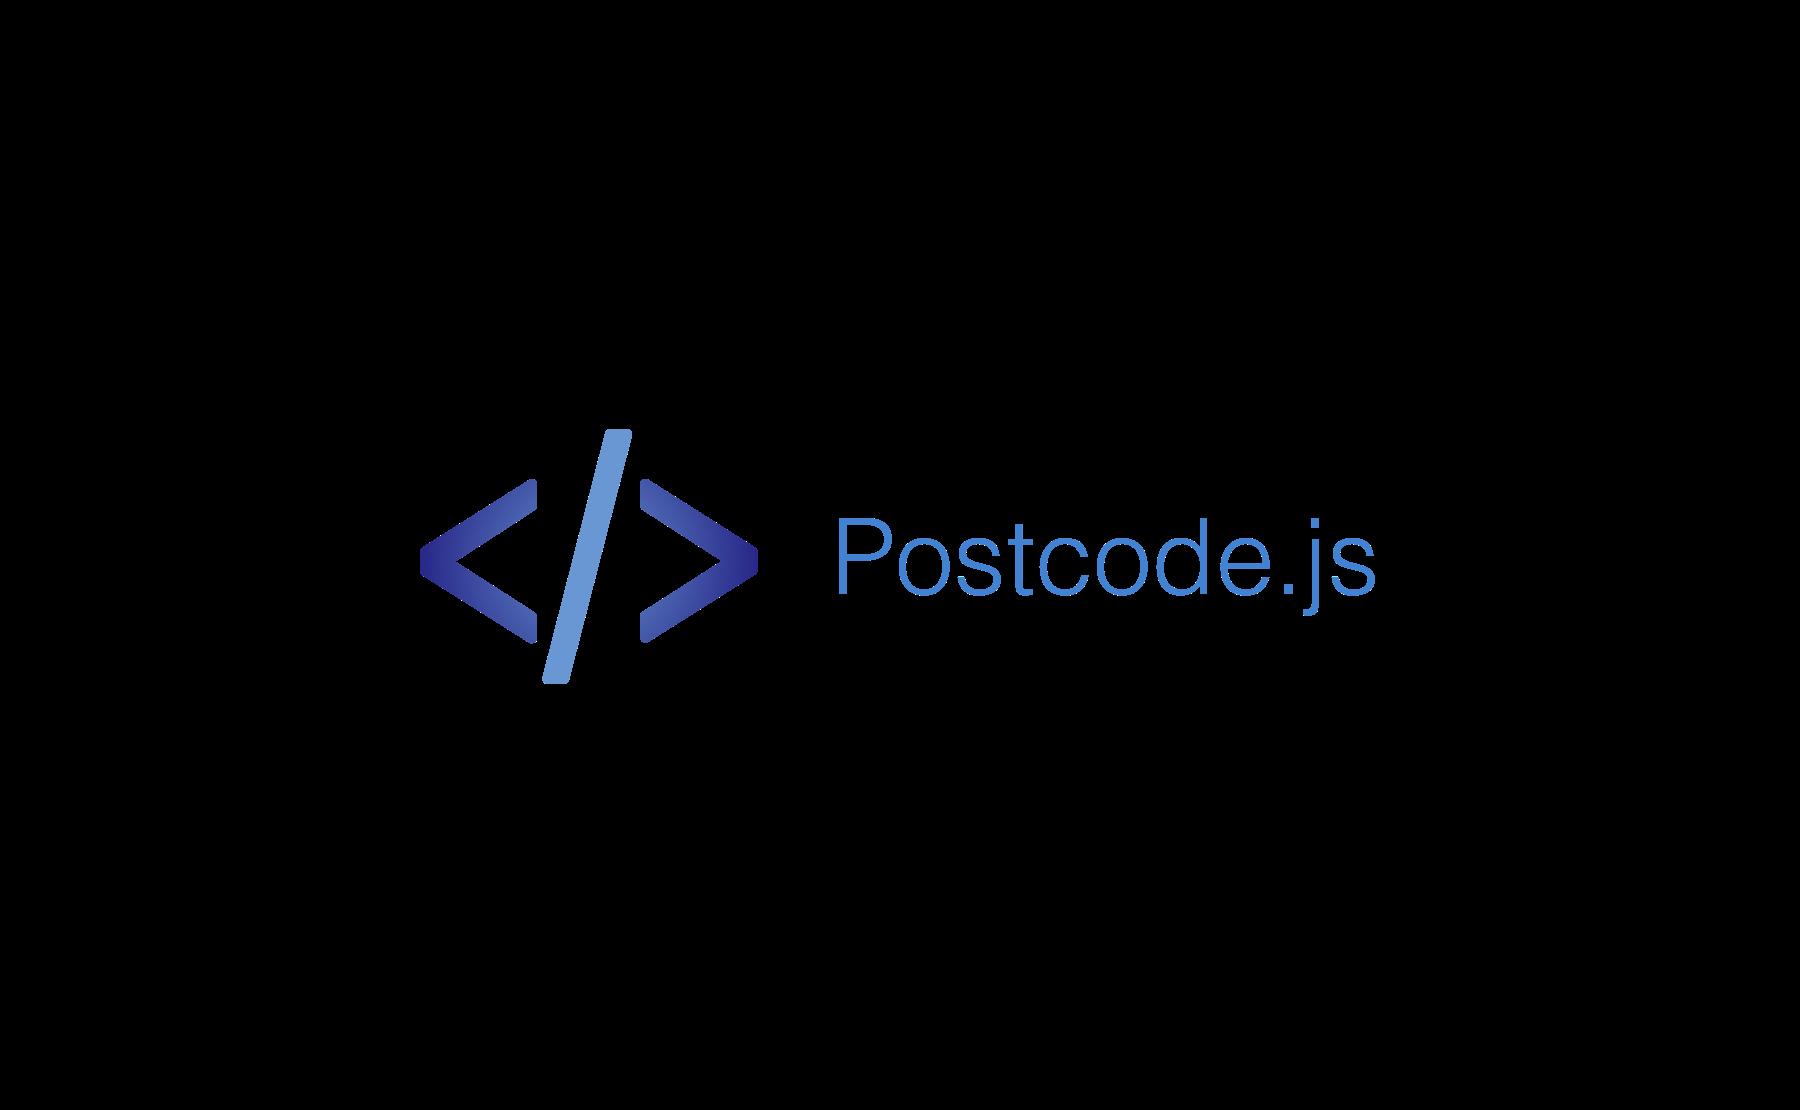 Postcode.js